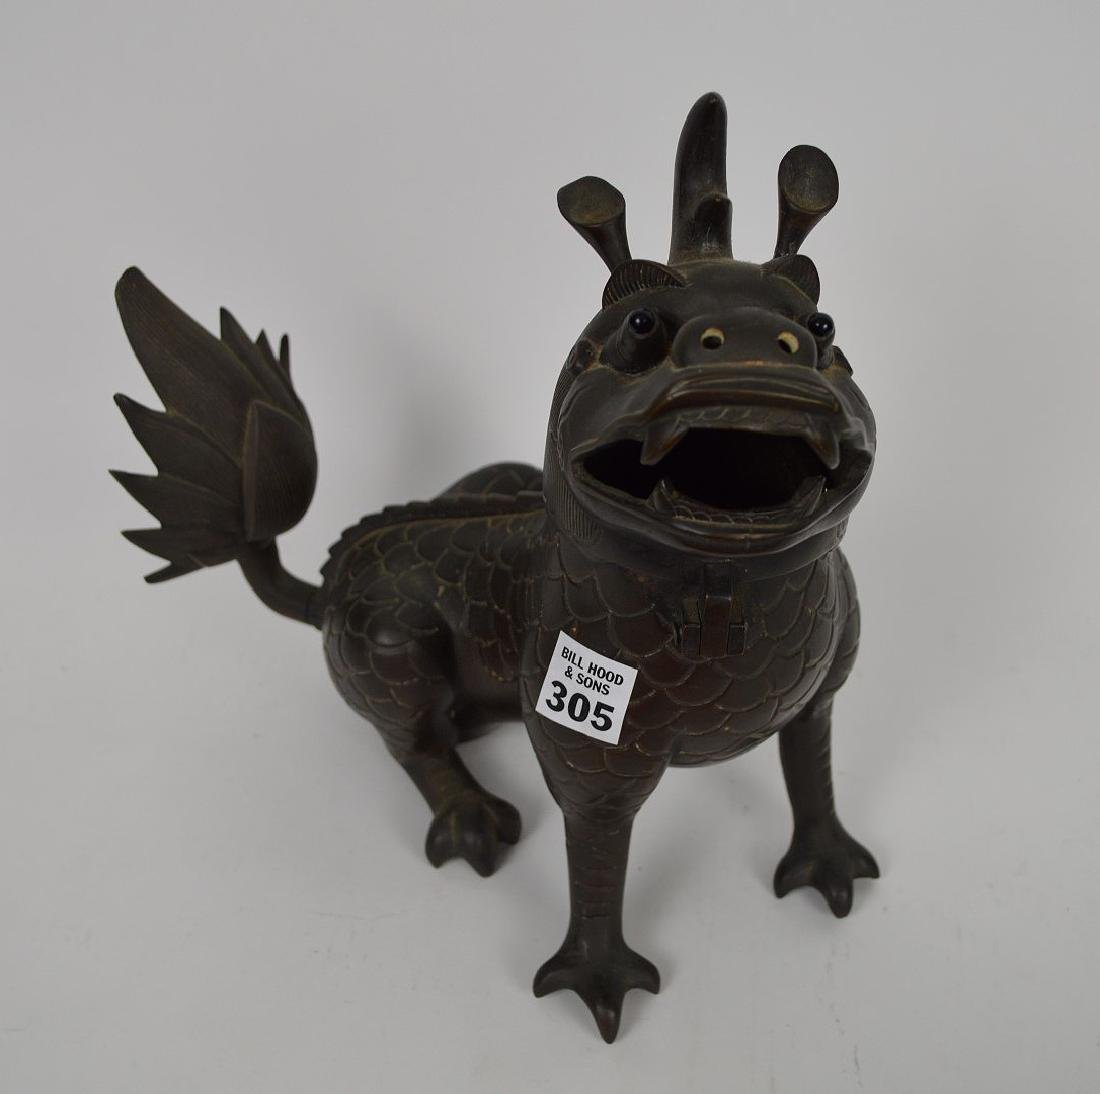 Chinese Bronze Foo Dog with glass eyes, head swings